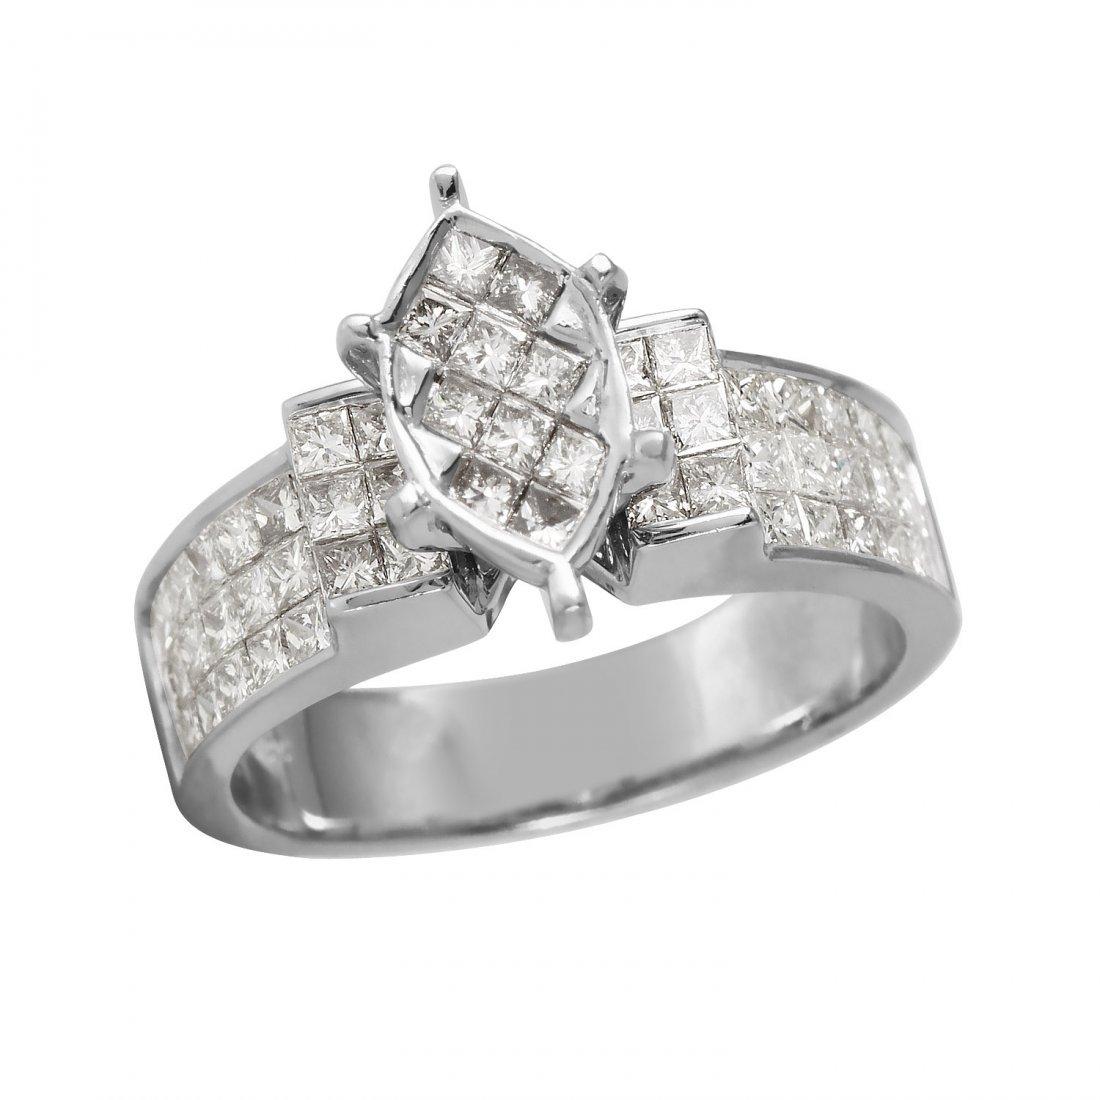 Ladies 1.62CTW Diamond 14K White Gold Ring